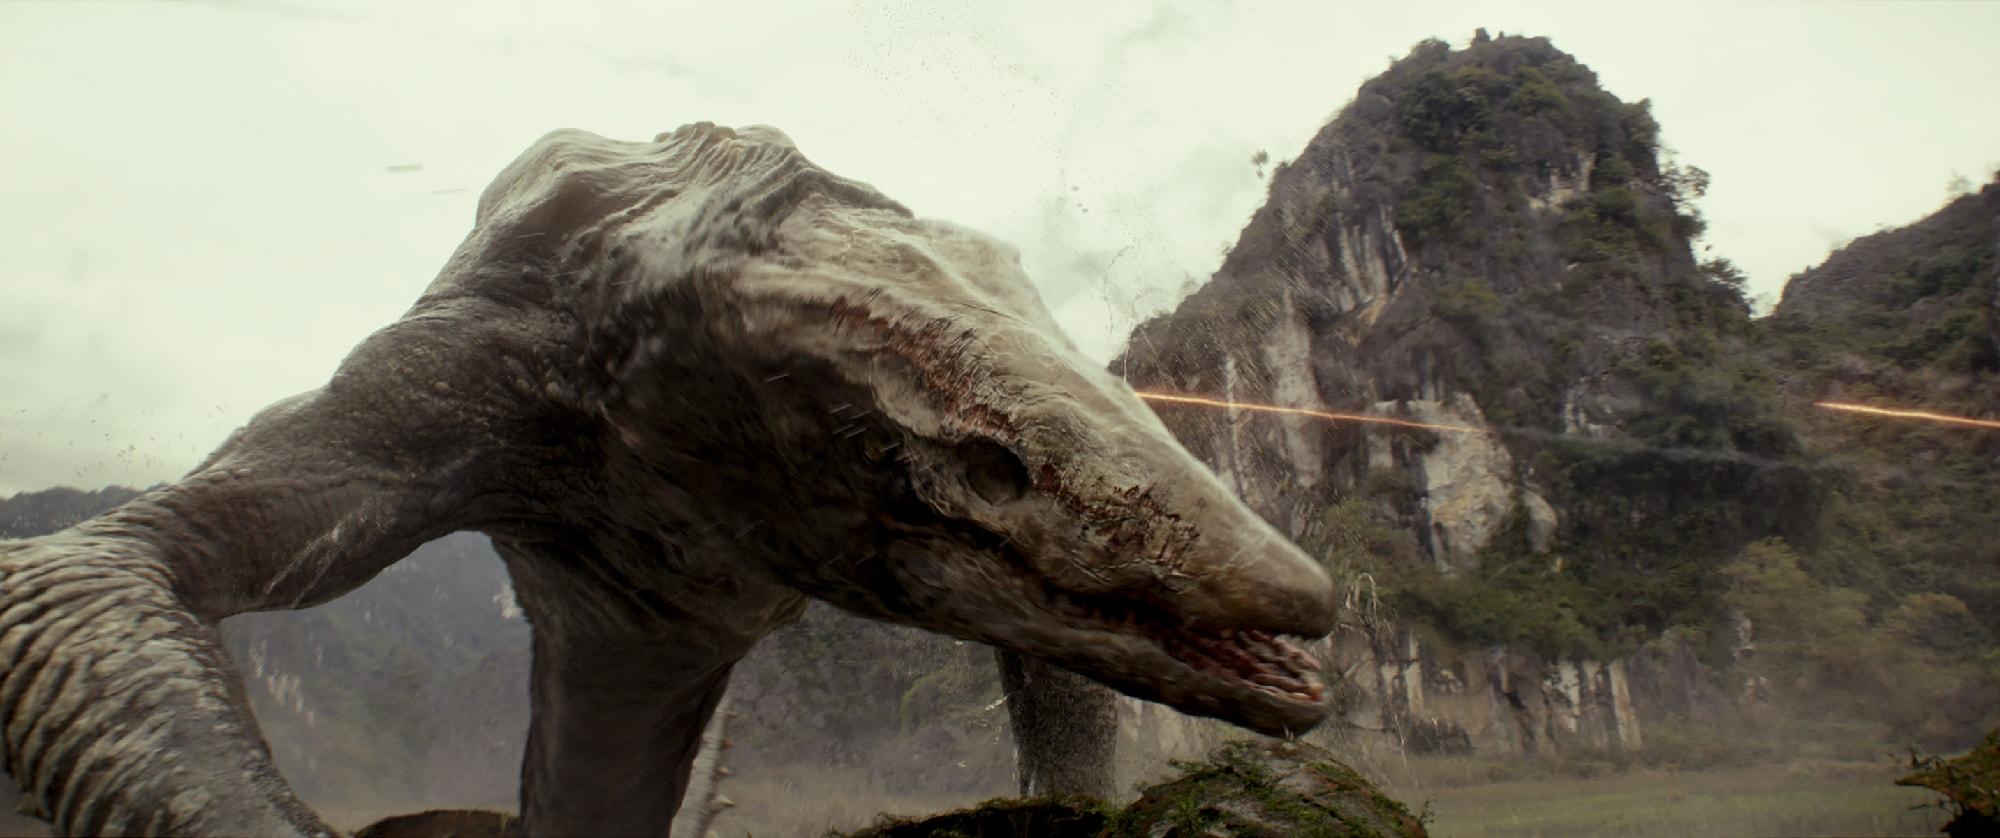 ILM Creatures On Kong's Skull Island